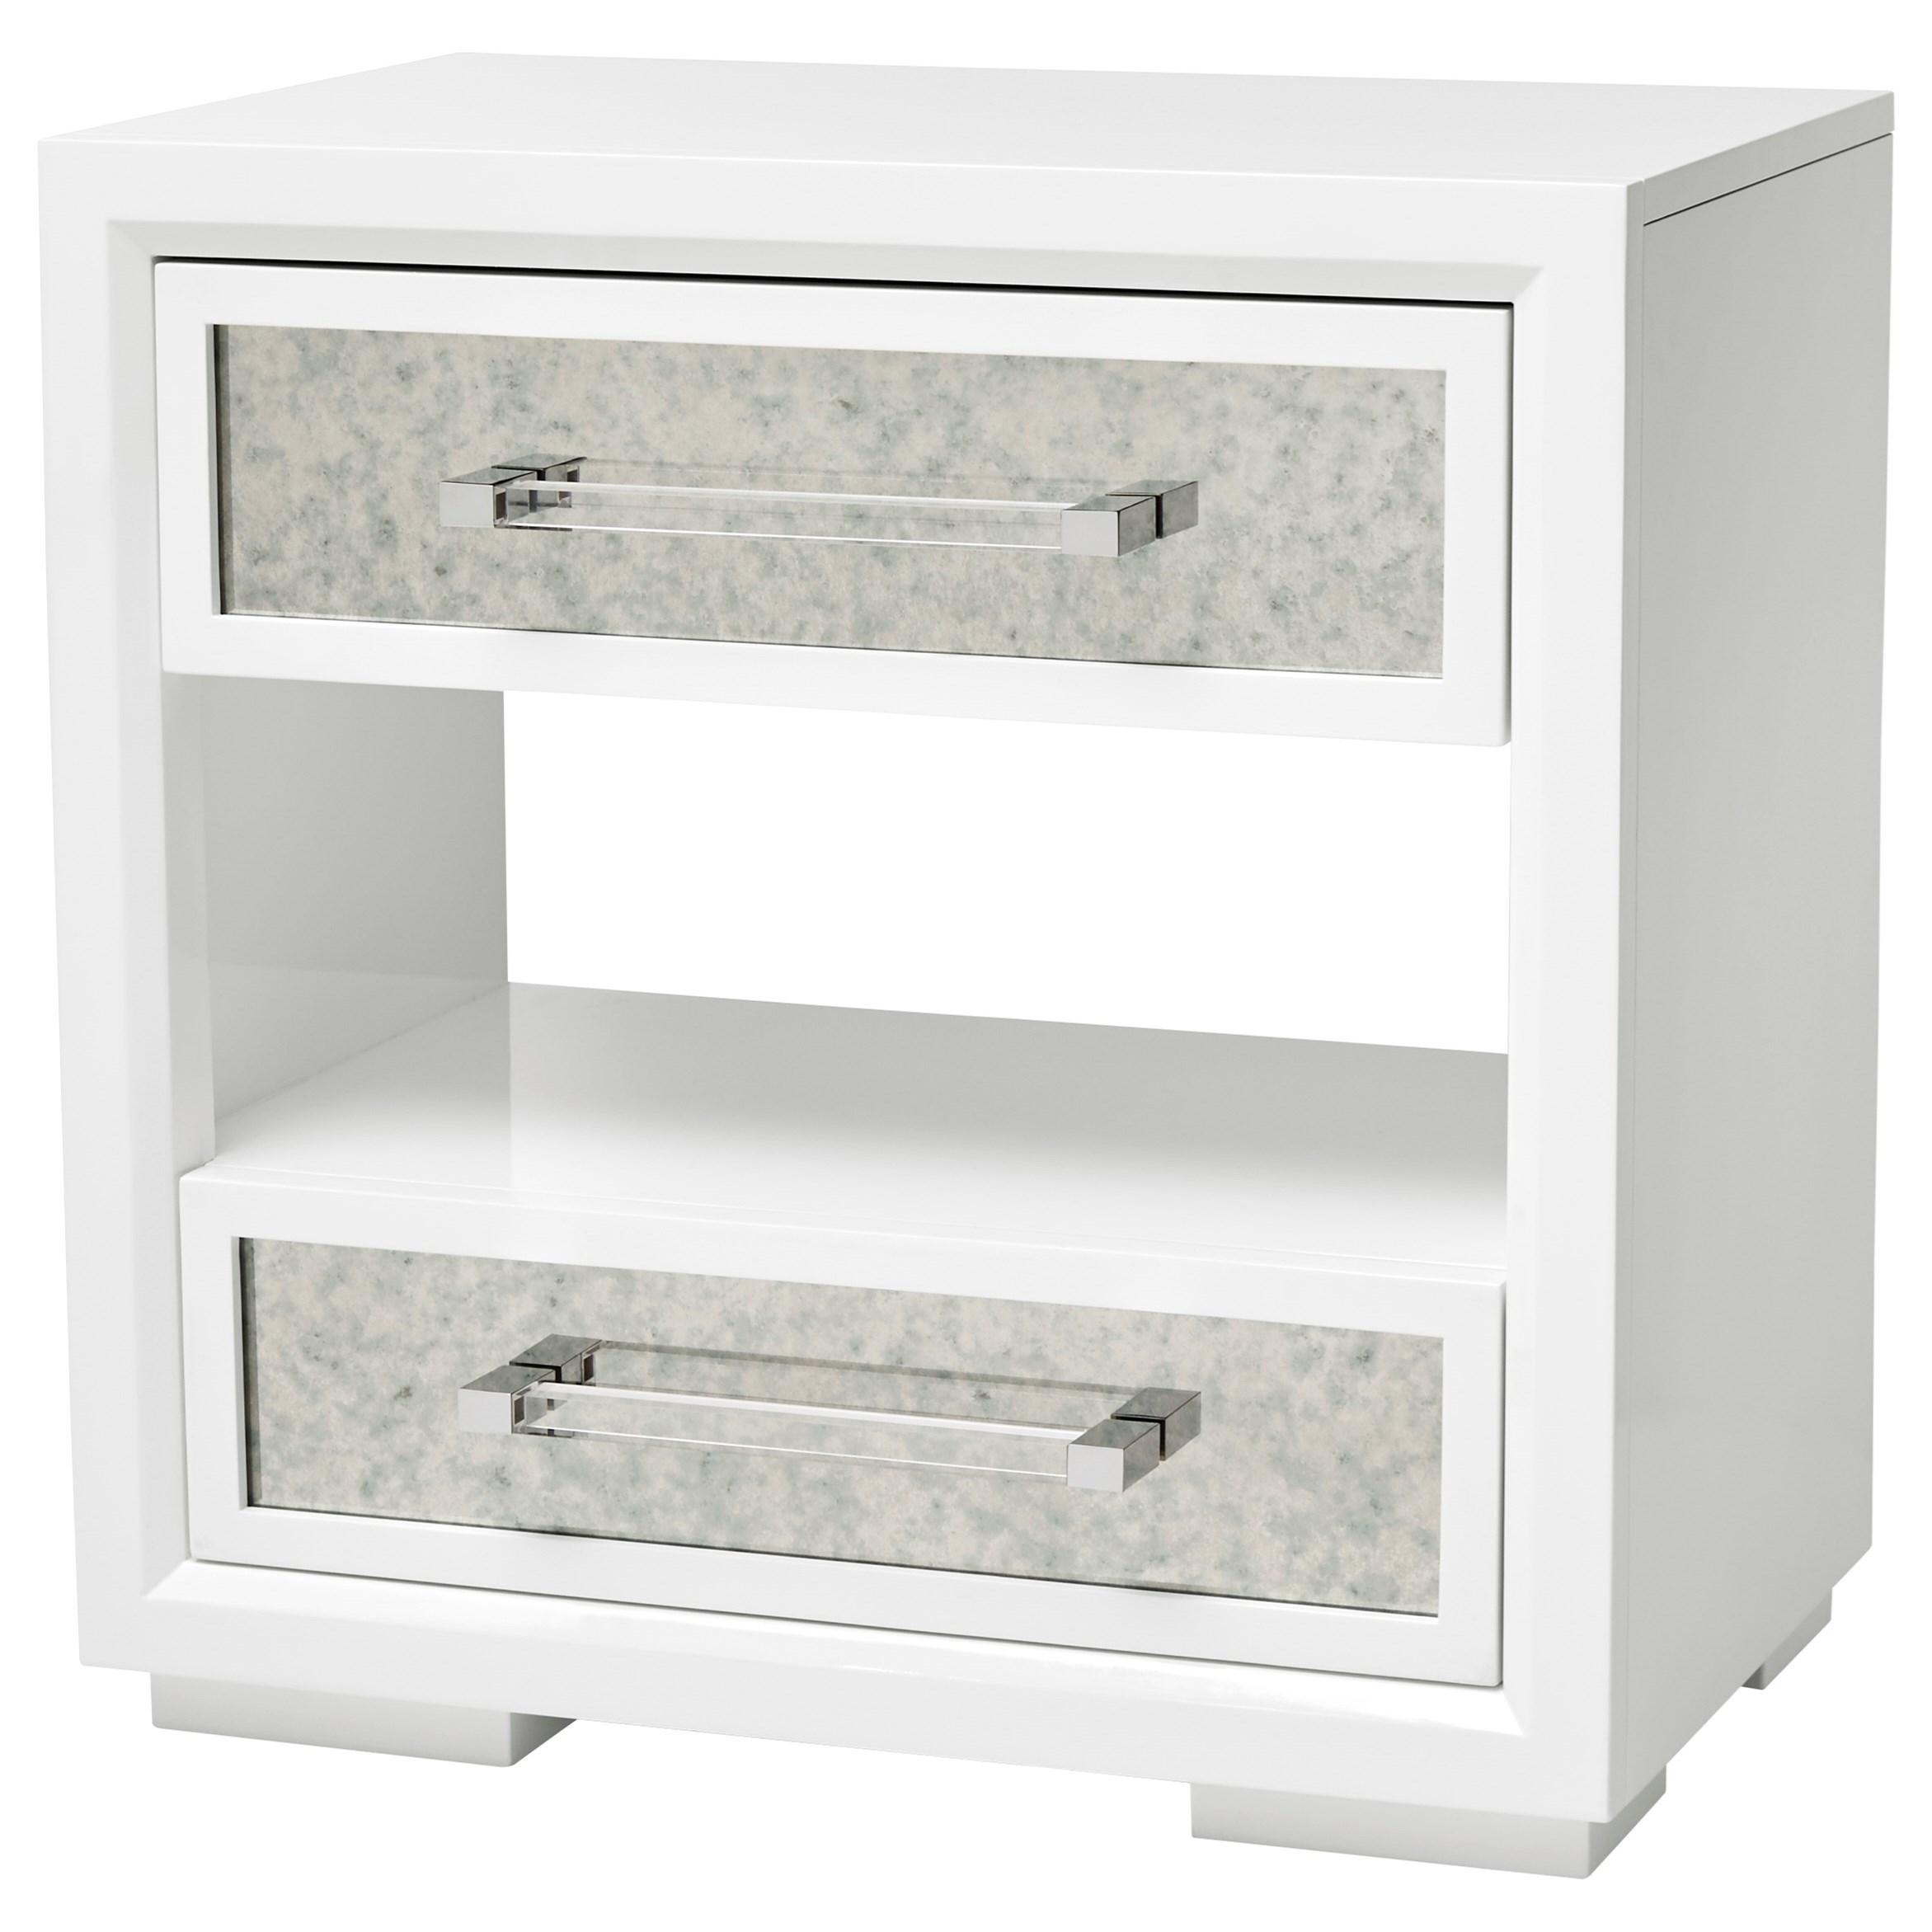 A R T Furniture Inc Epicenters 33127 Gloss White Brickell